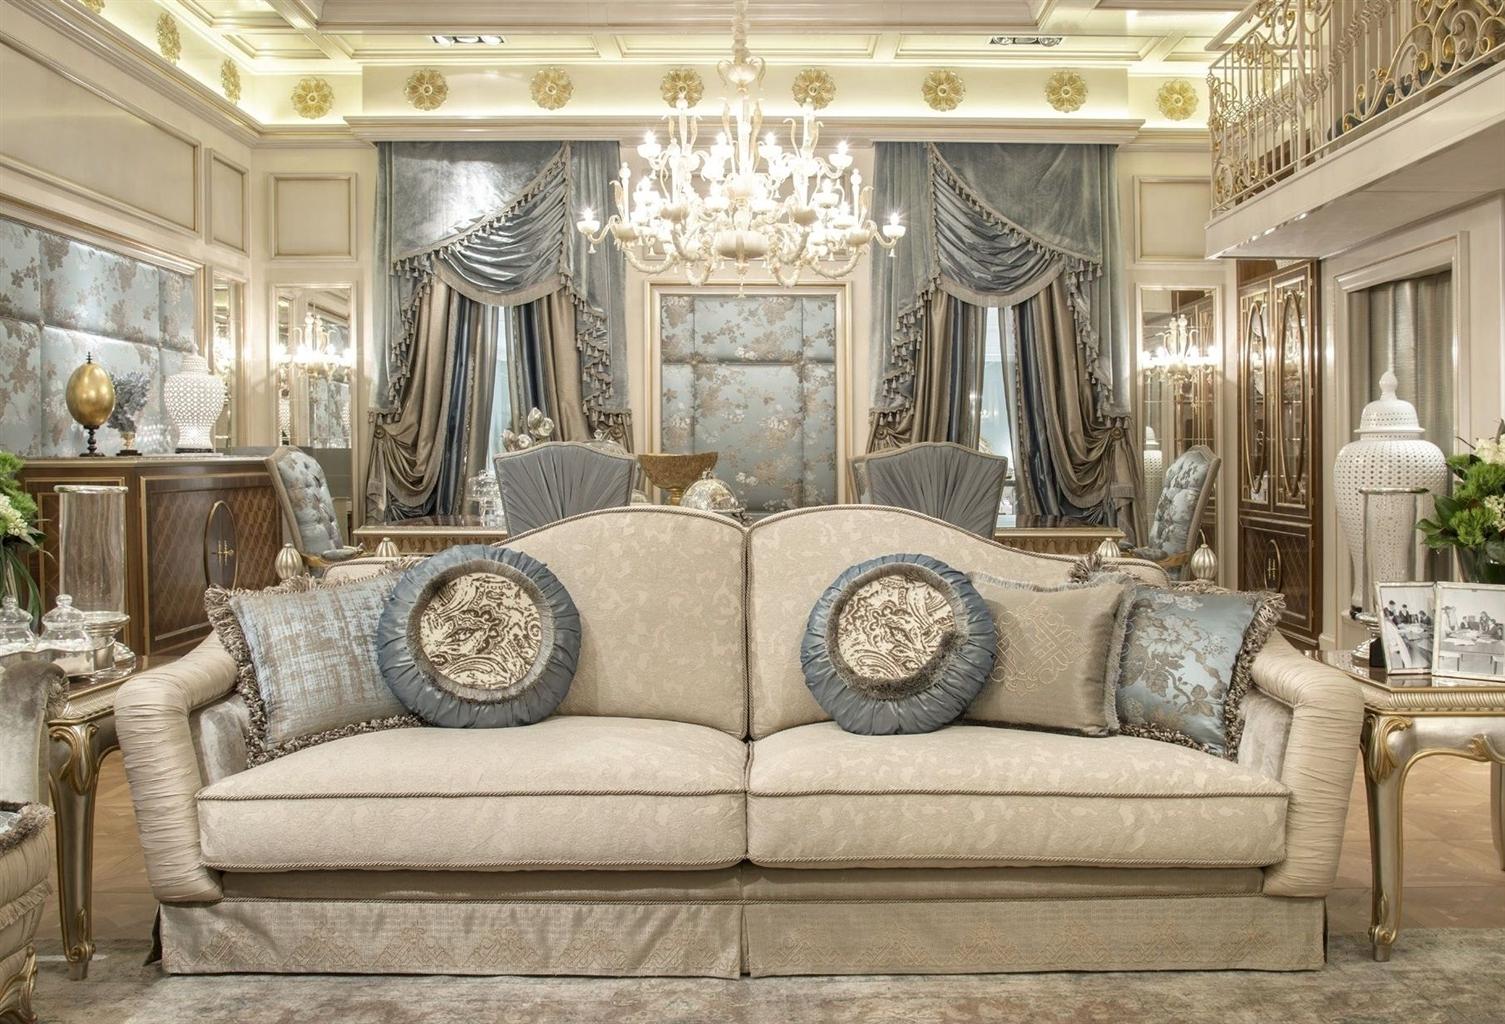 Fine Fabrics Highlight This Extraordinary Hand Made Luxury Sofa (Image 2 of 10)